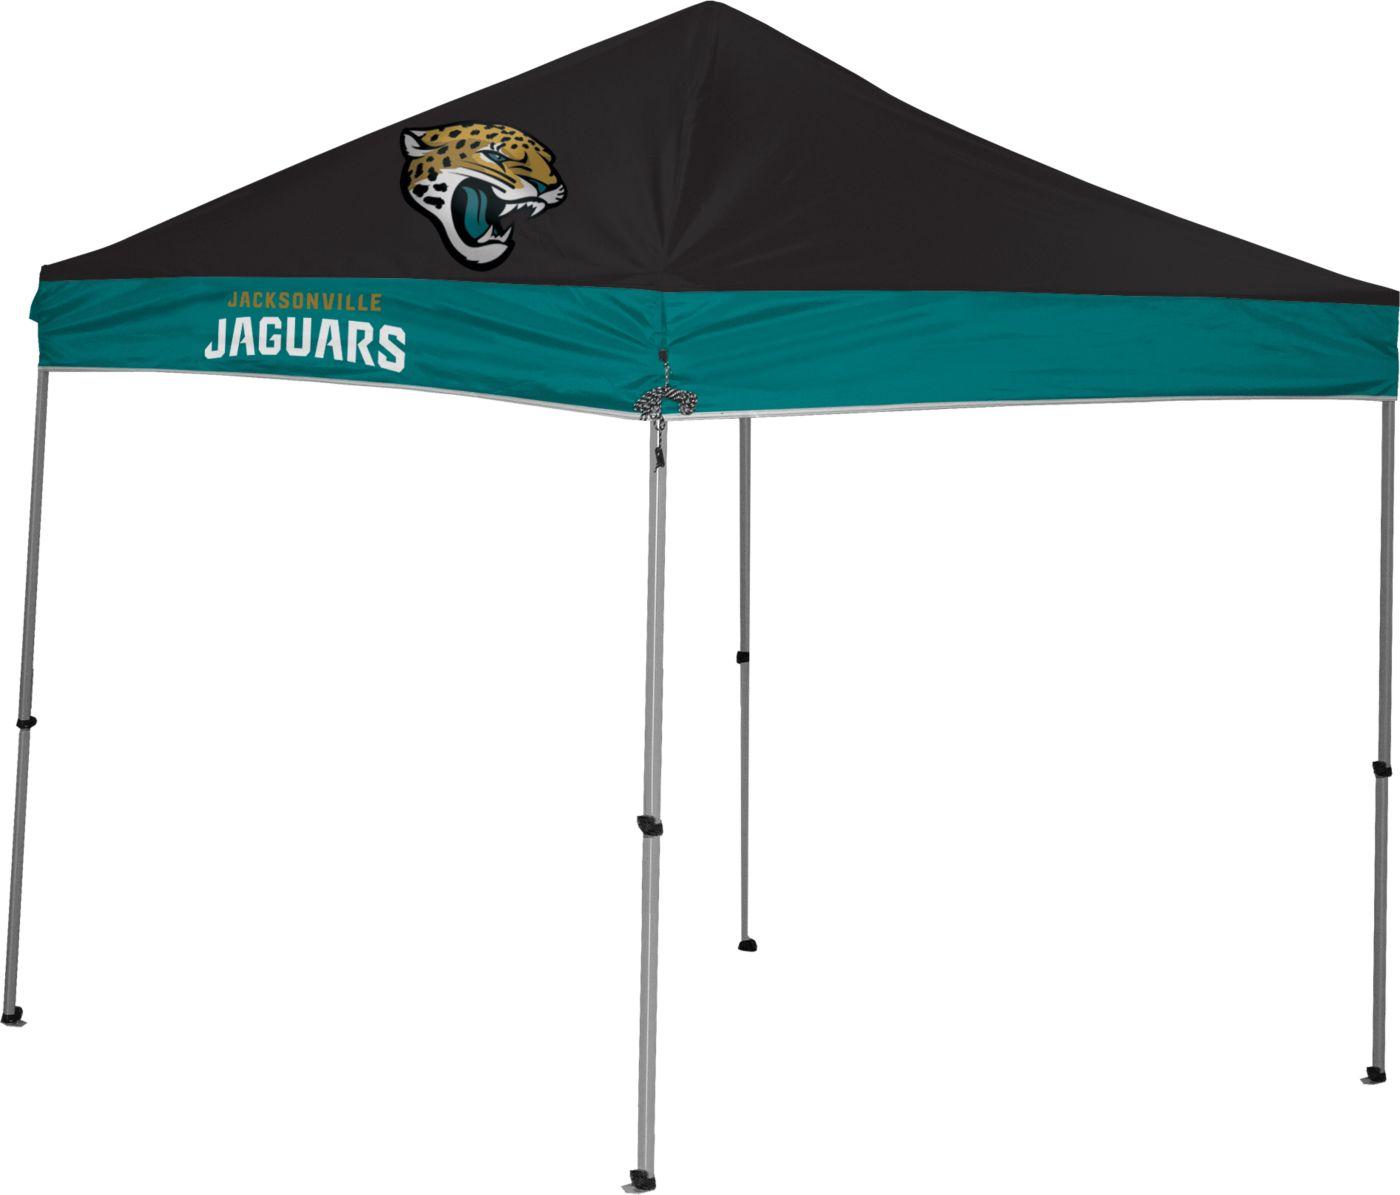 Rawlings Jacksonville Jaguars 9'x9' Canopy Tent